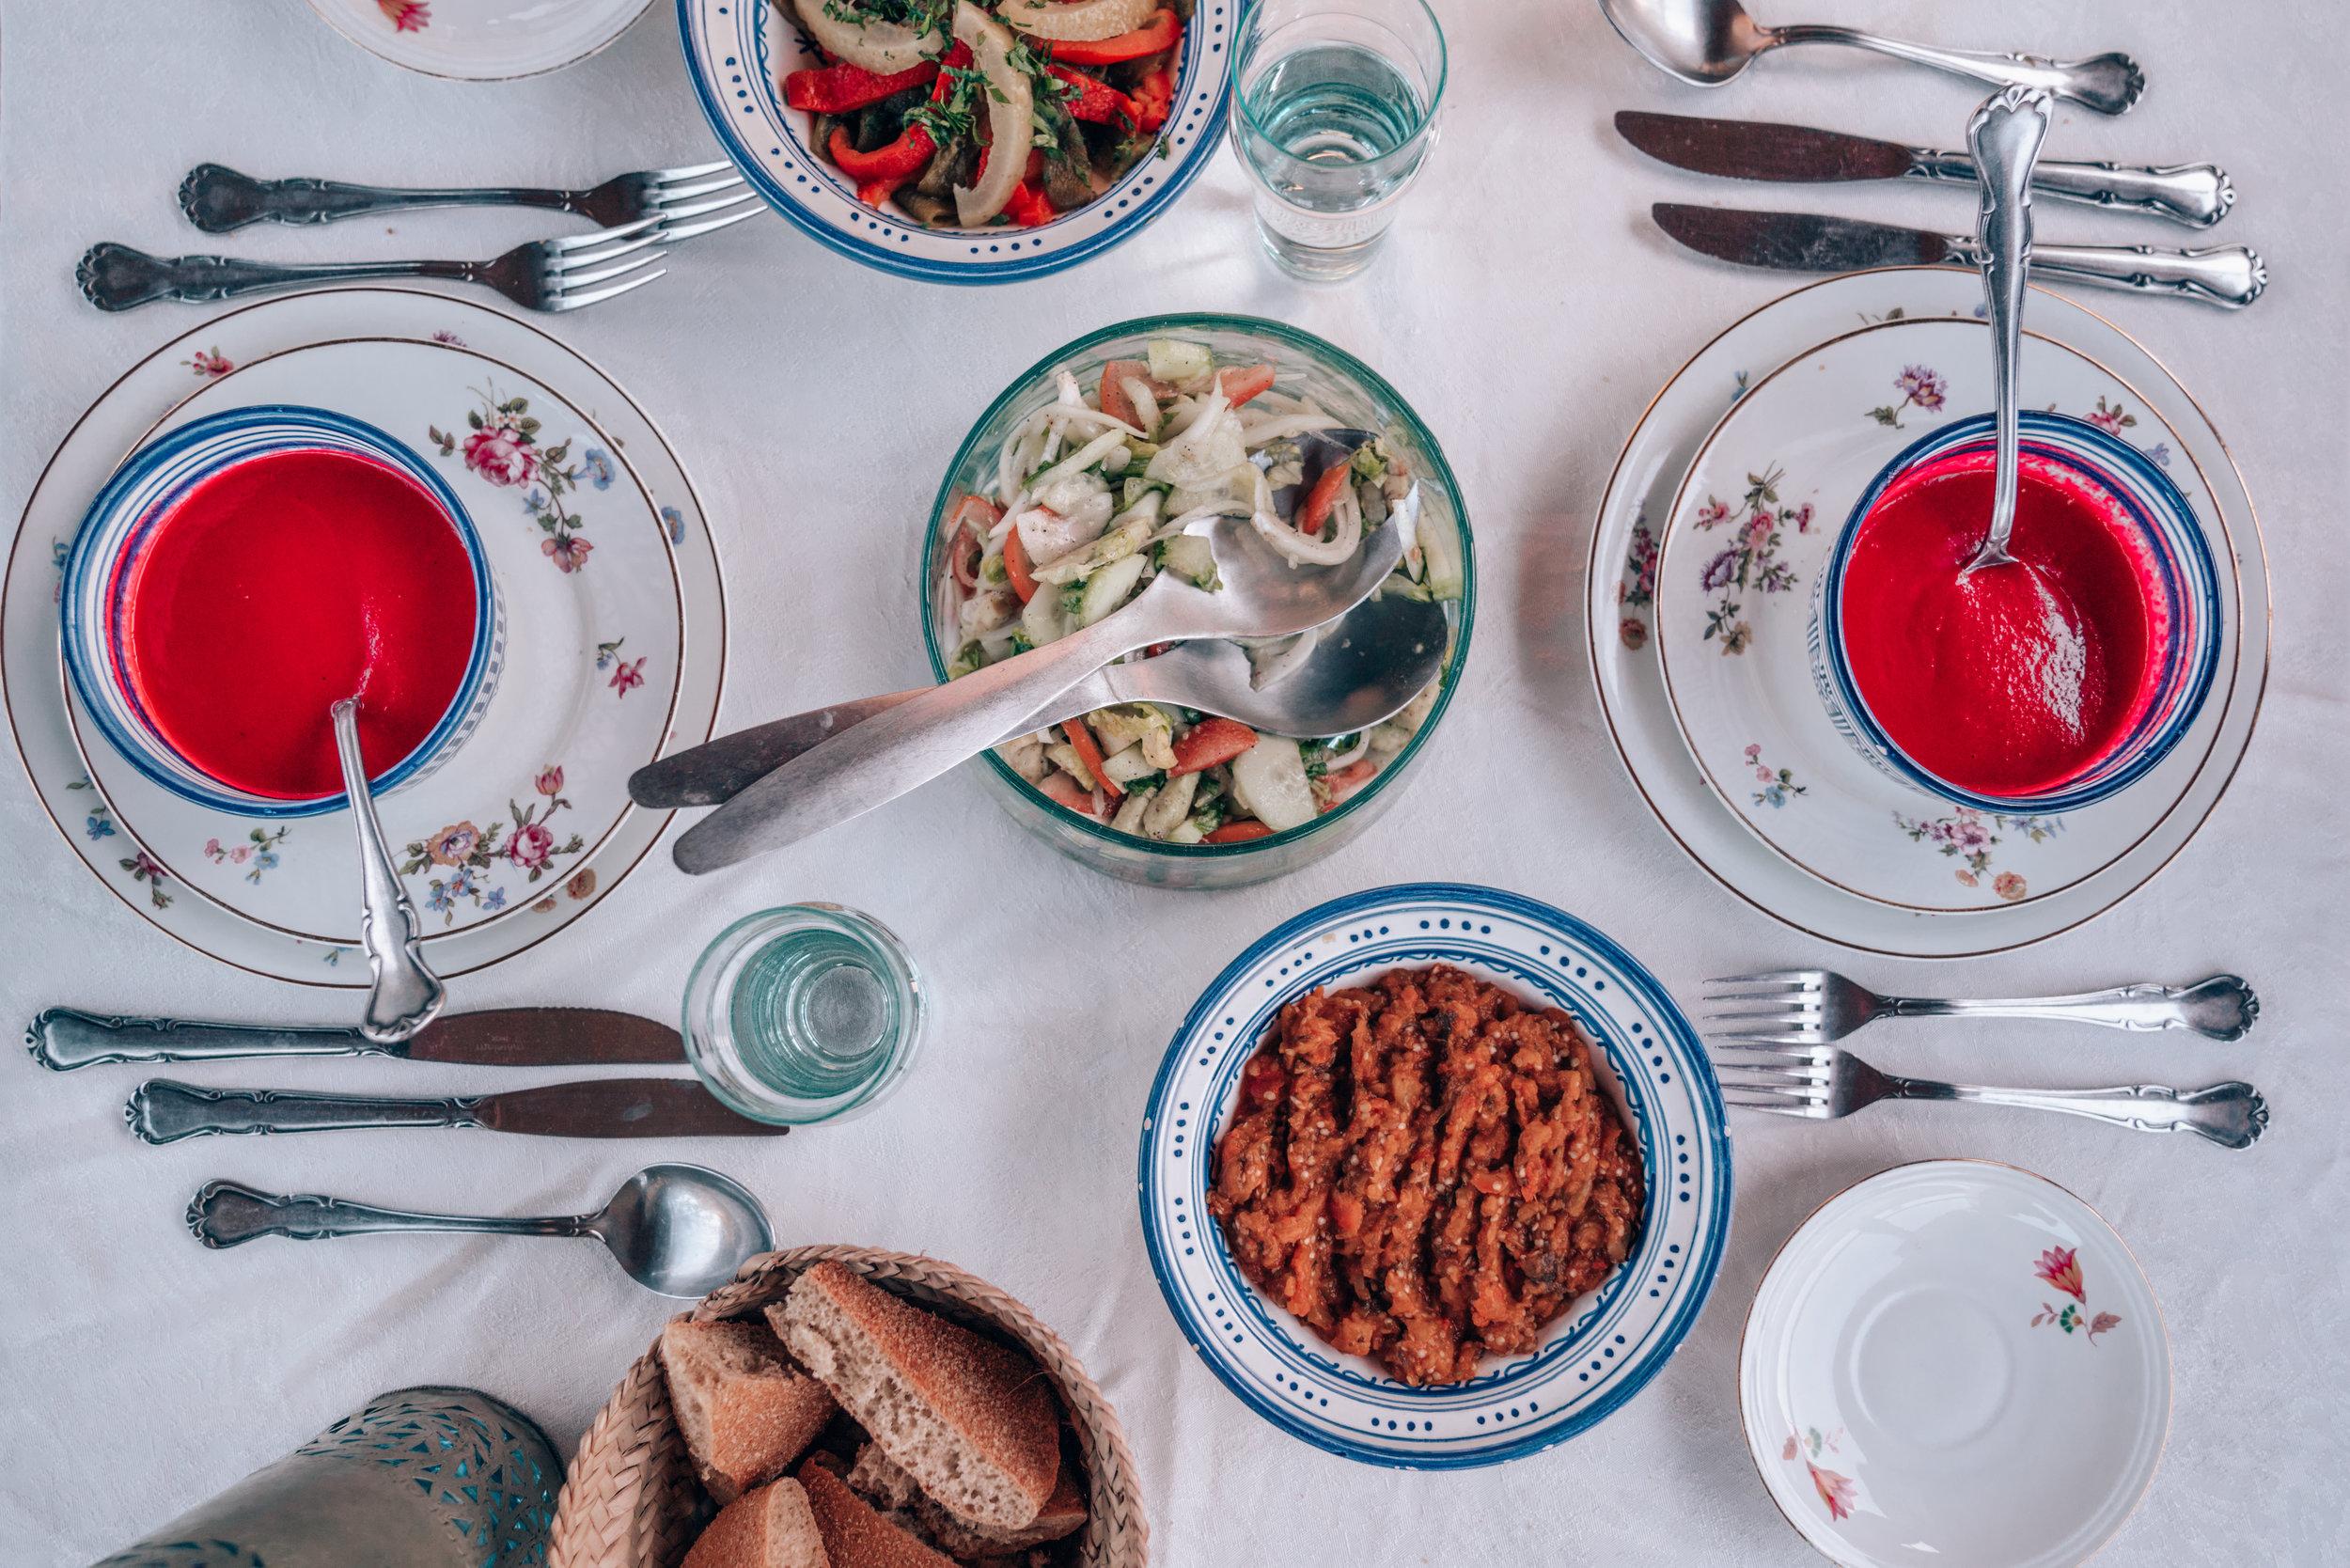 Riad Anata Dinner Spread in Fes, Morocco